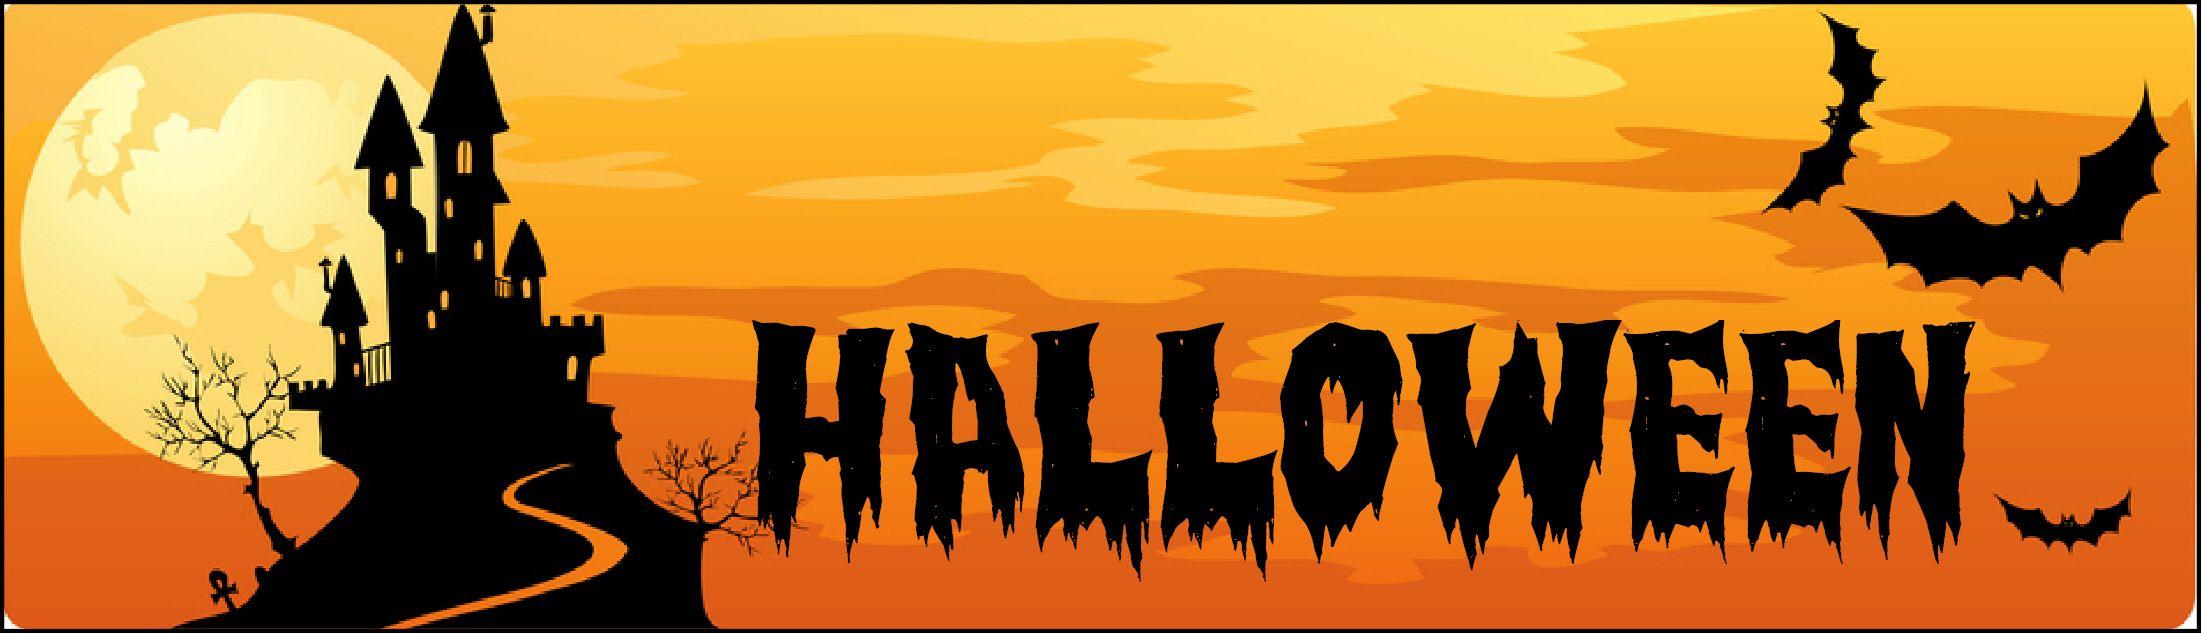 halloween horror shop